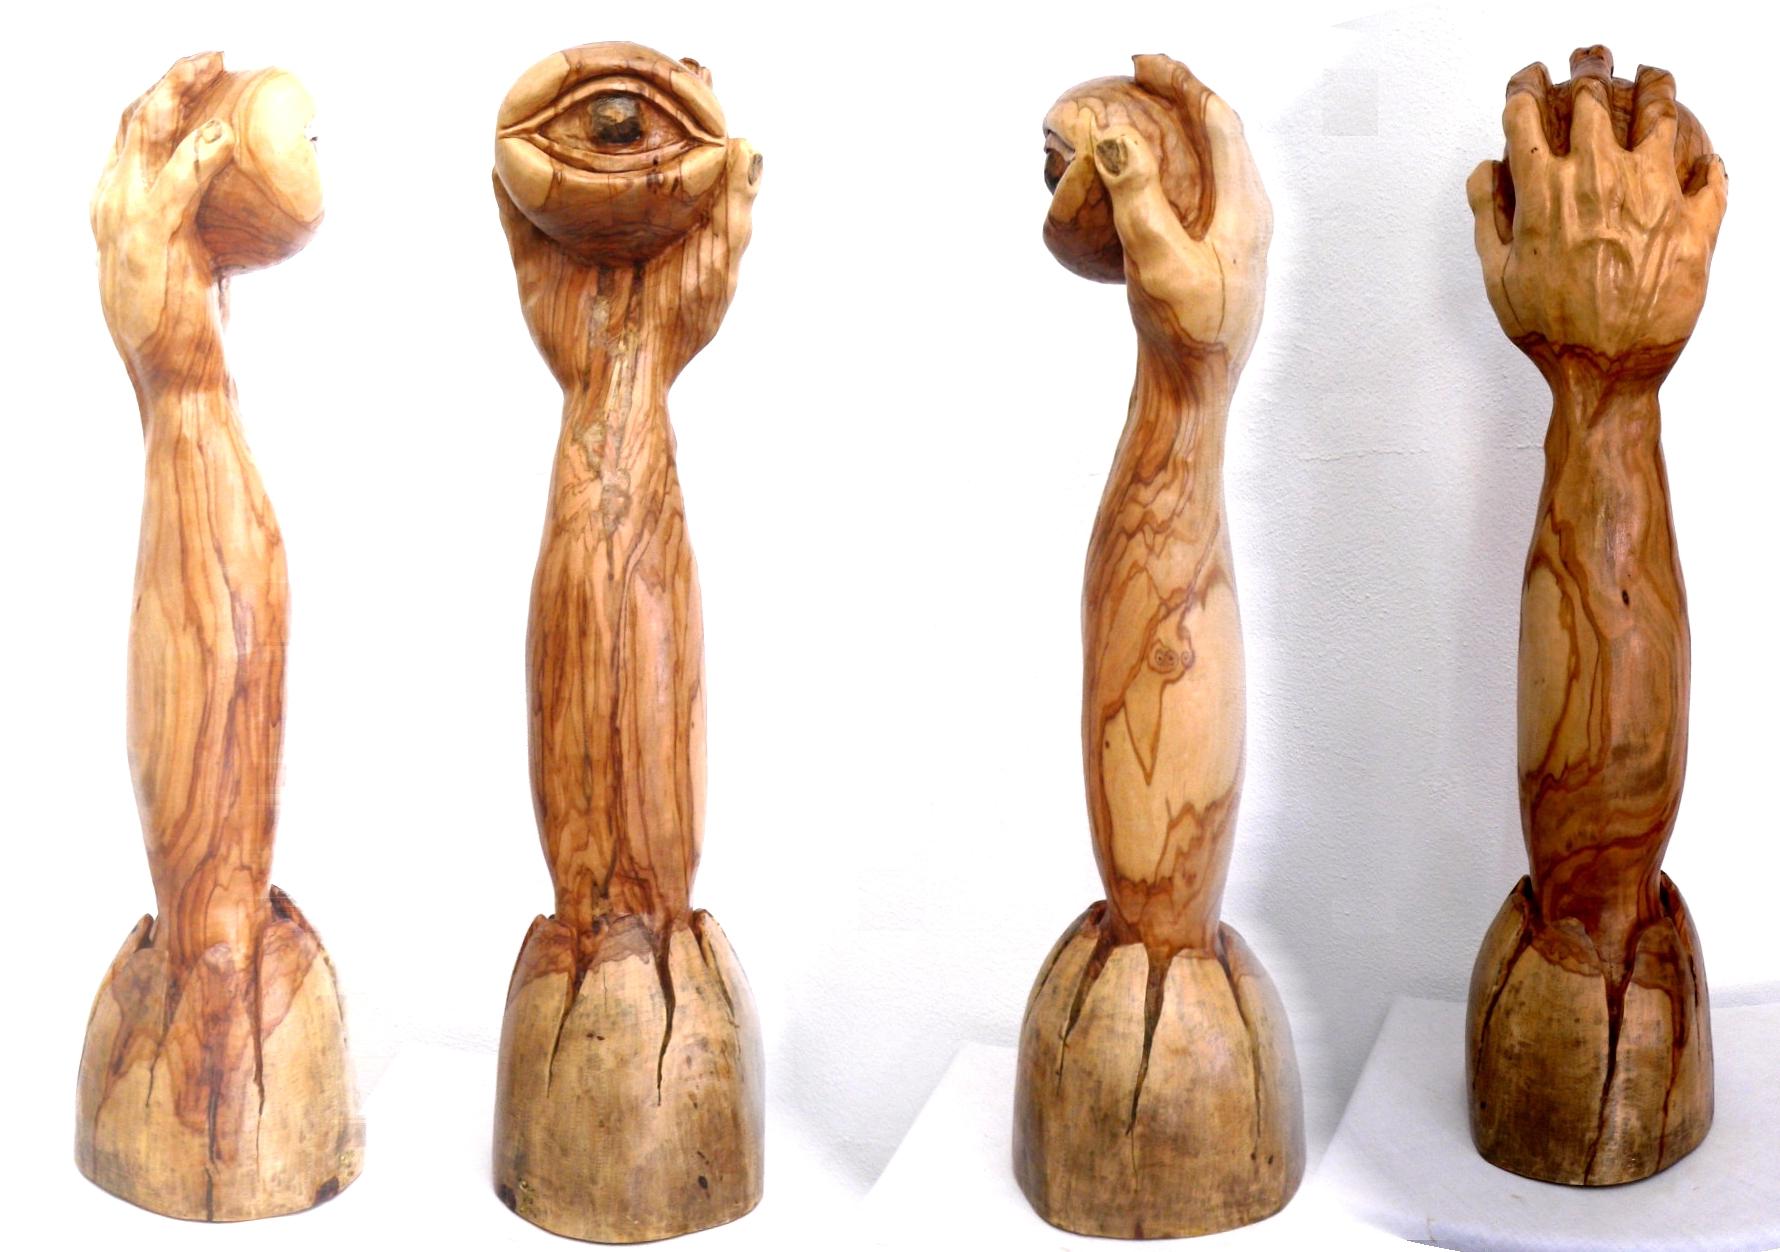 Emerging Eye, Olive wood sculpture | Eric Kempson ...